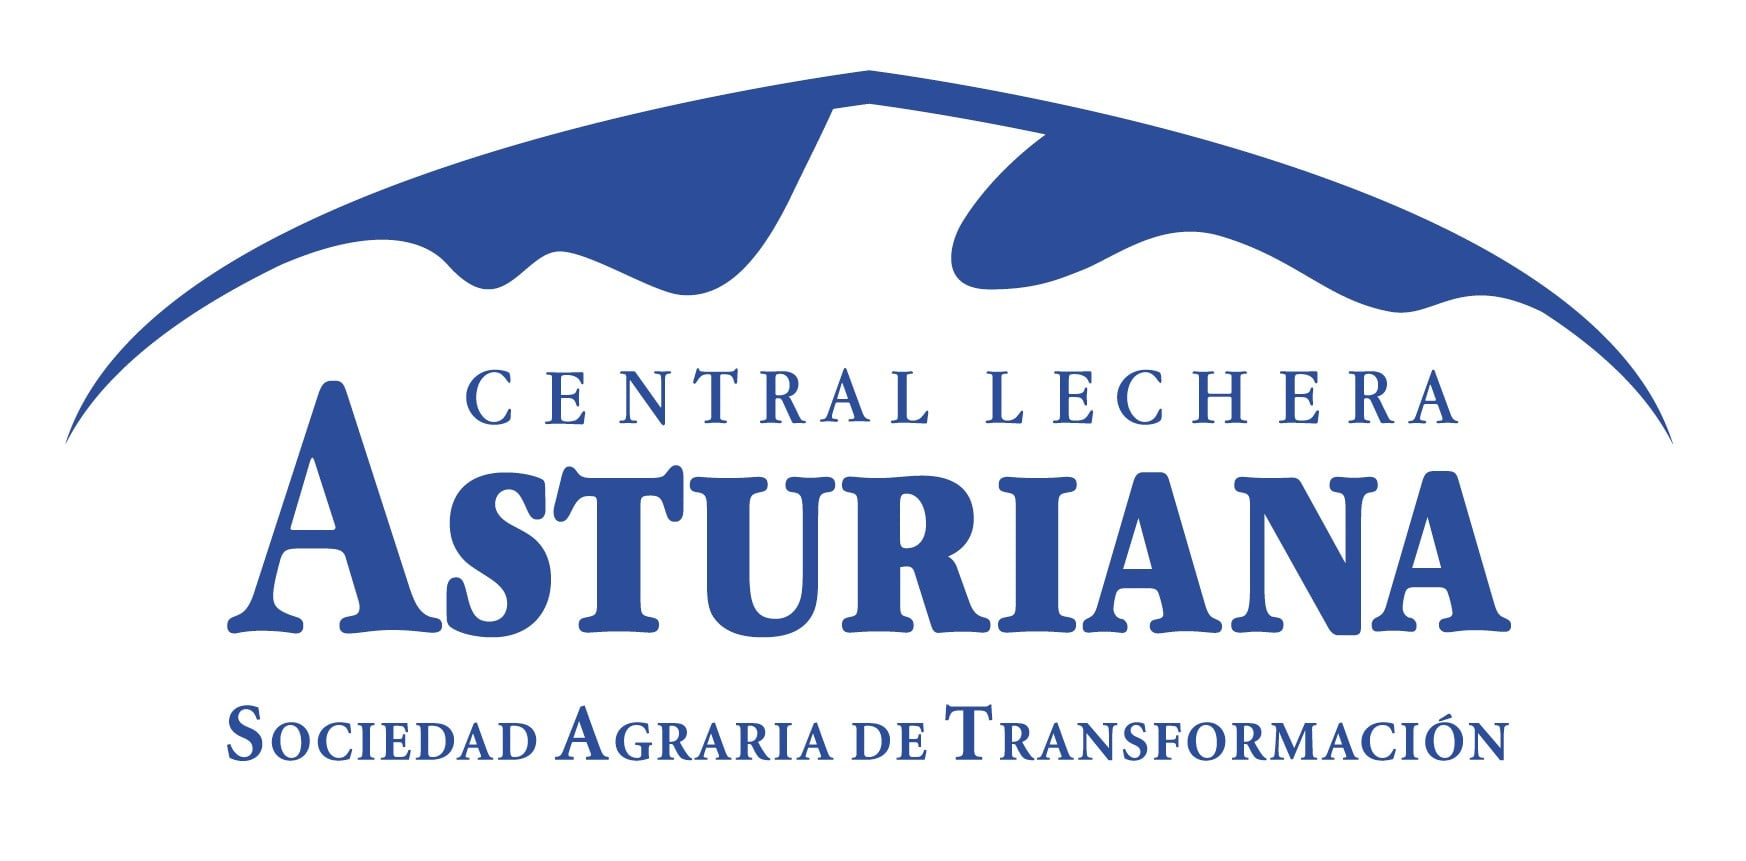 Central Lechera Asturiana SAT Logo